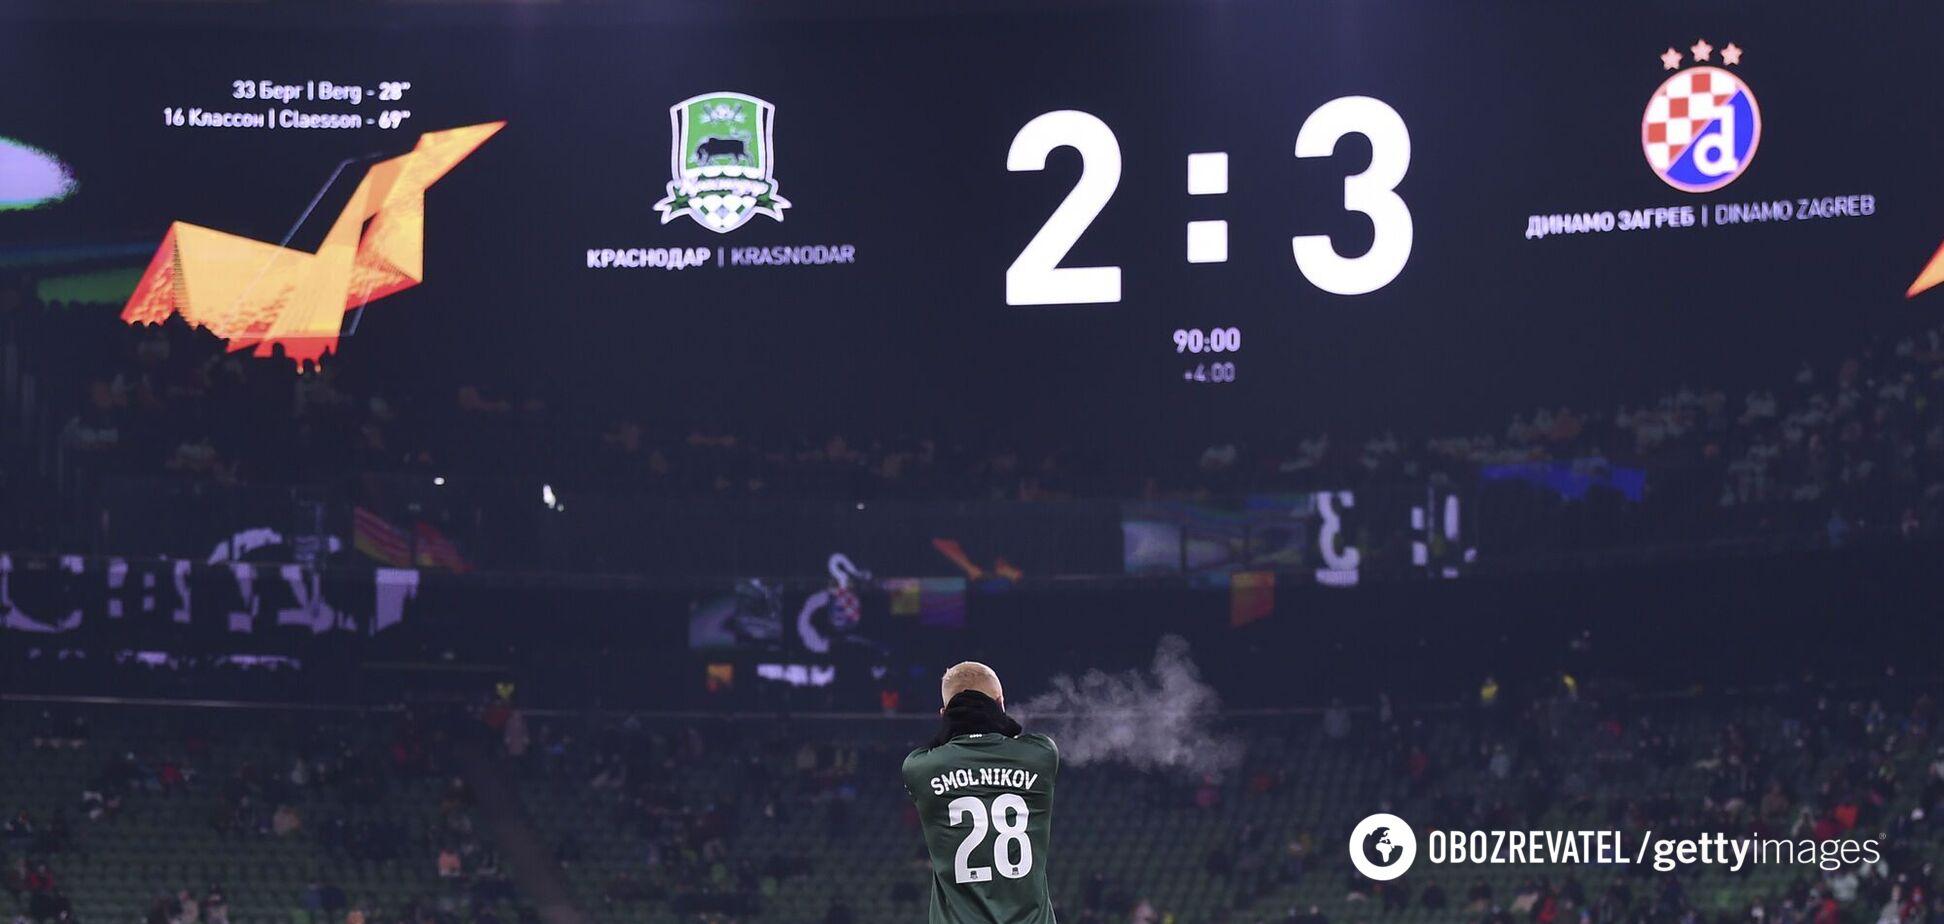 'Краснодар' проиграл 'Динамо' Загреб со счетом 2:3